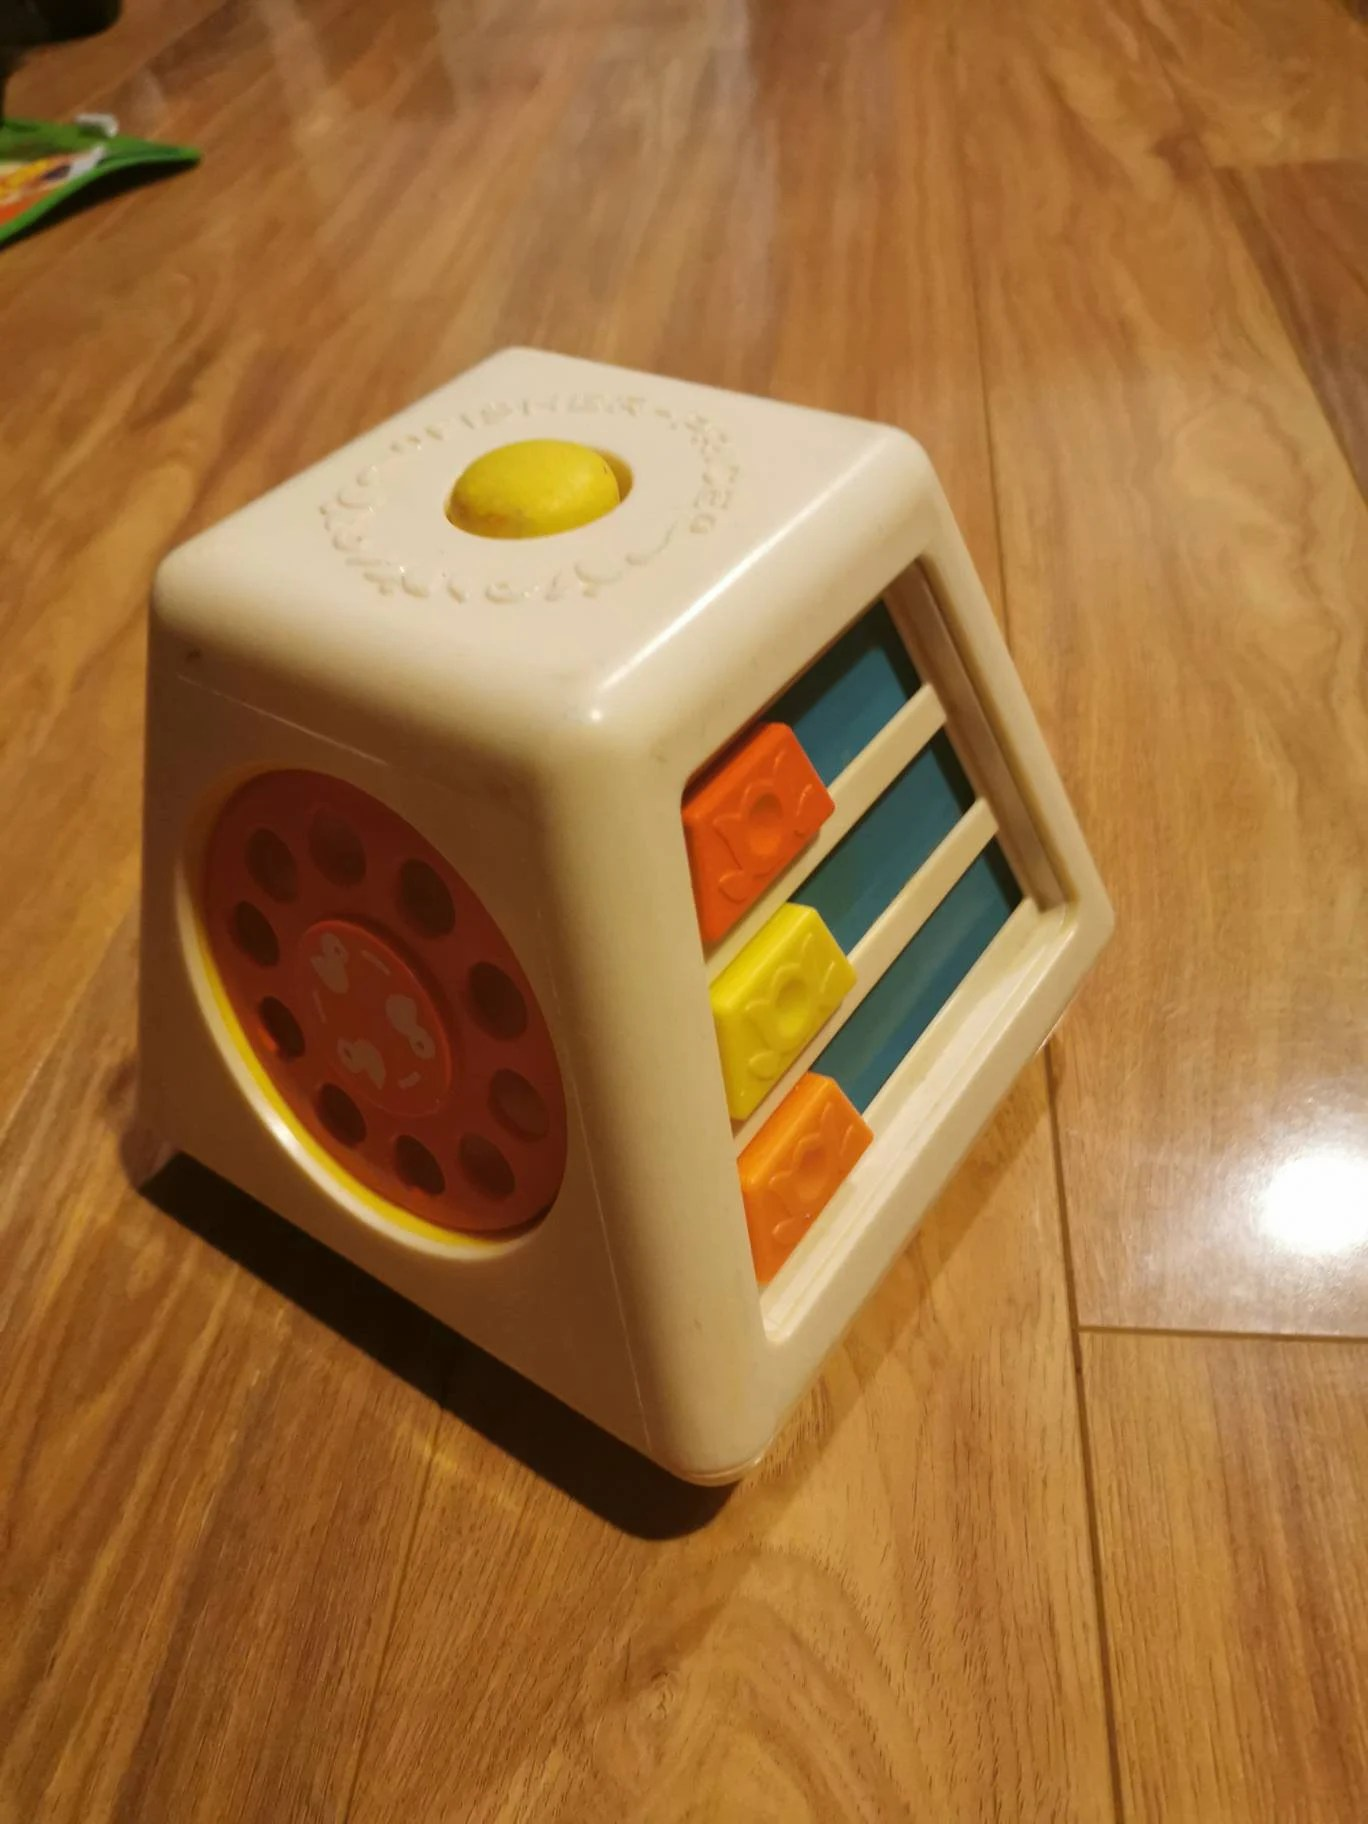 Vintage 1978 fisher price baby/toddler toy